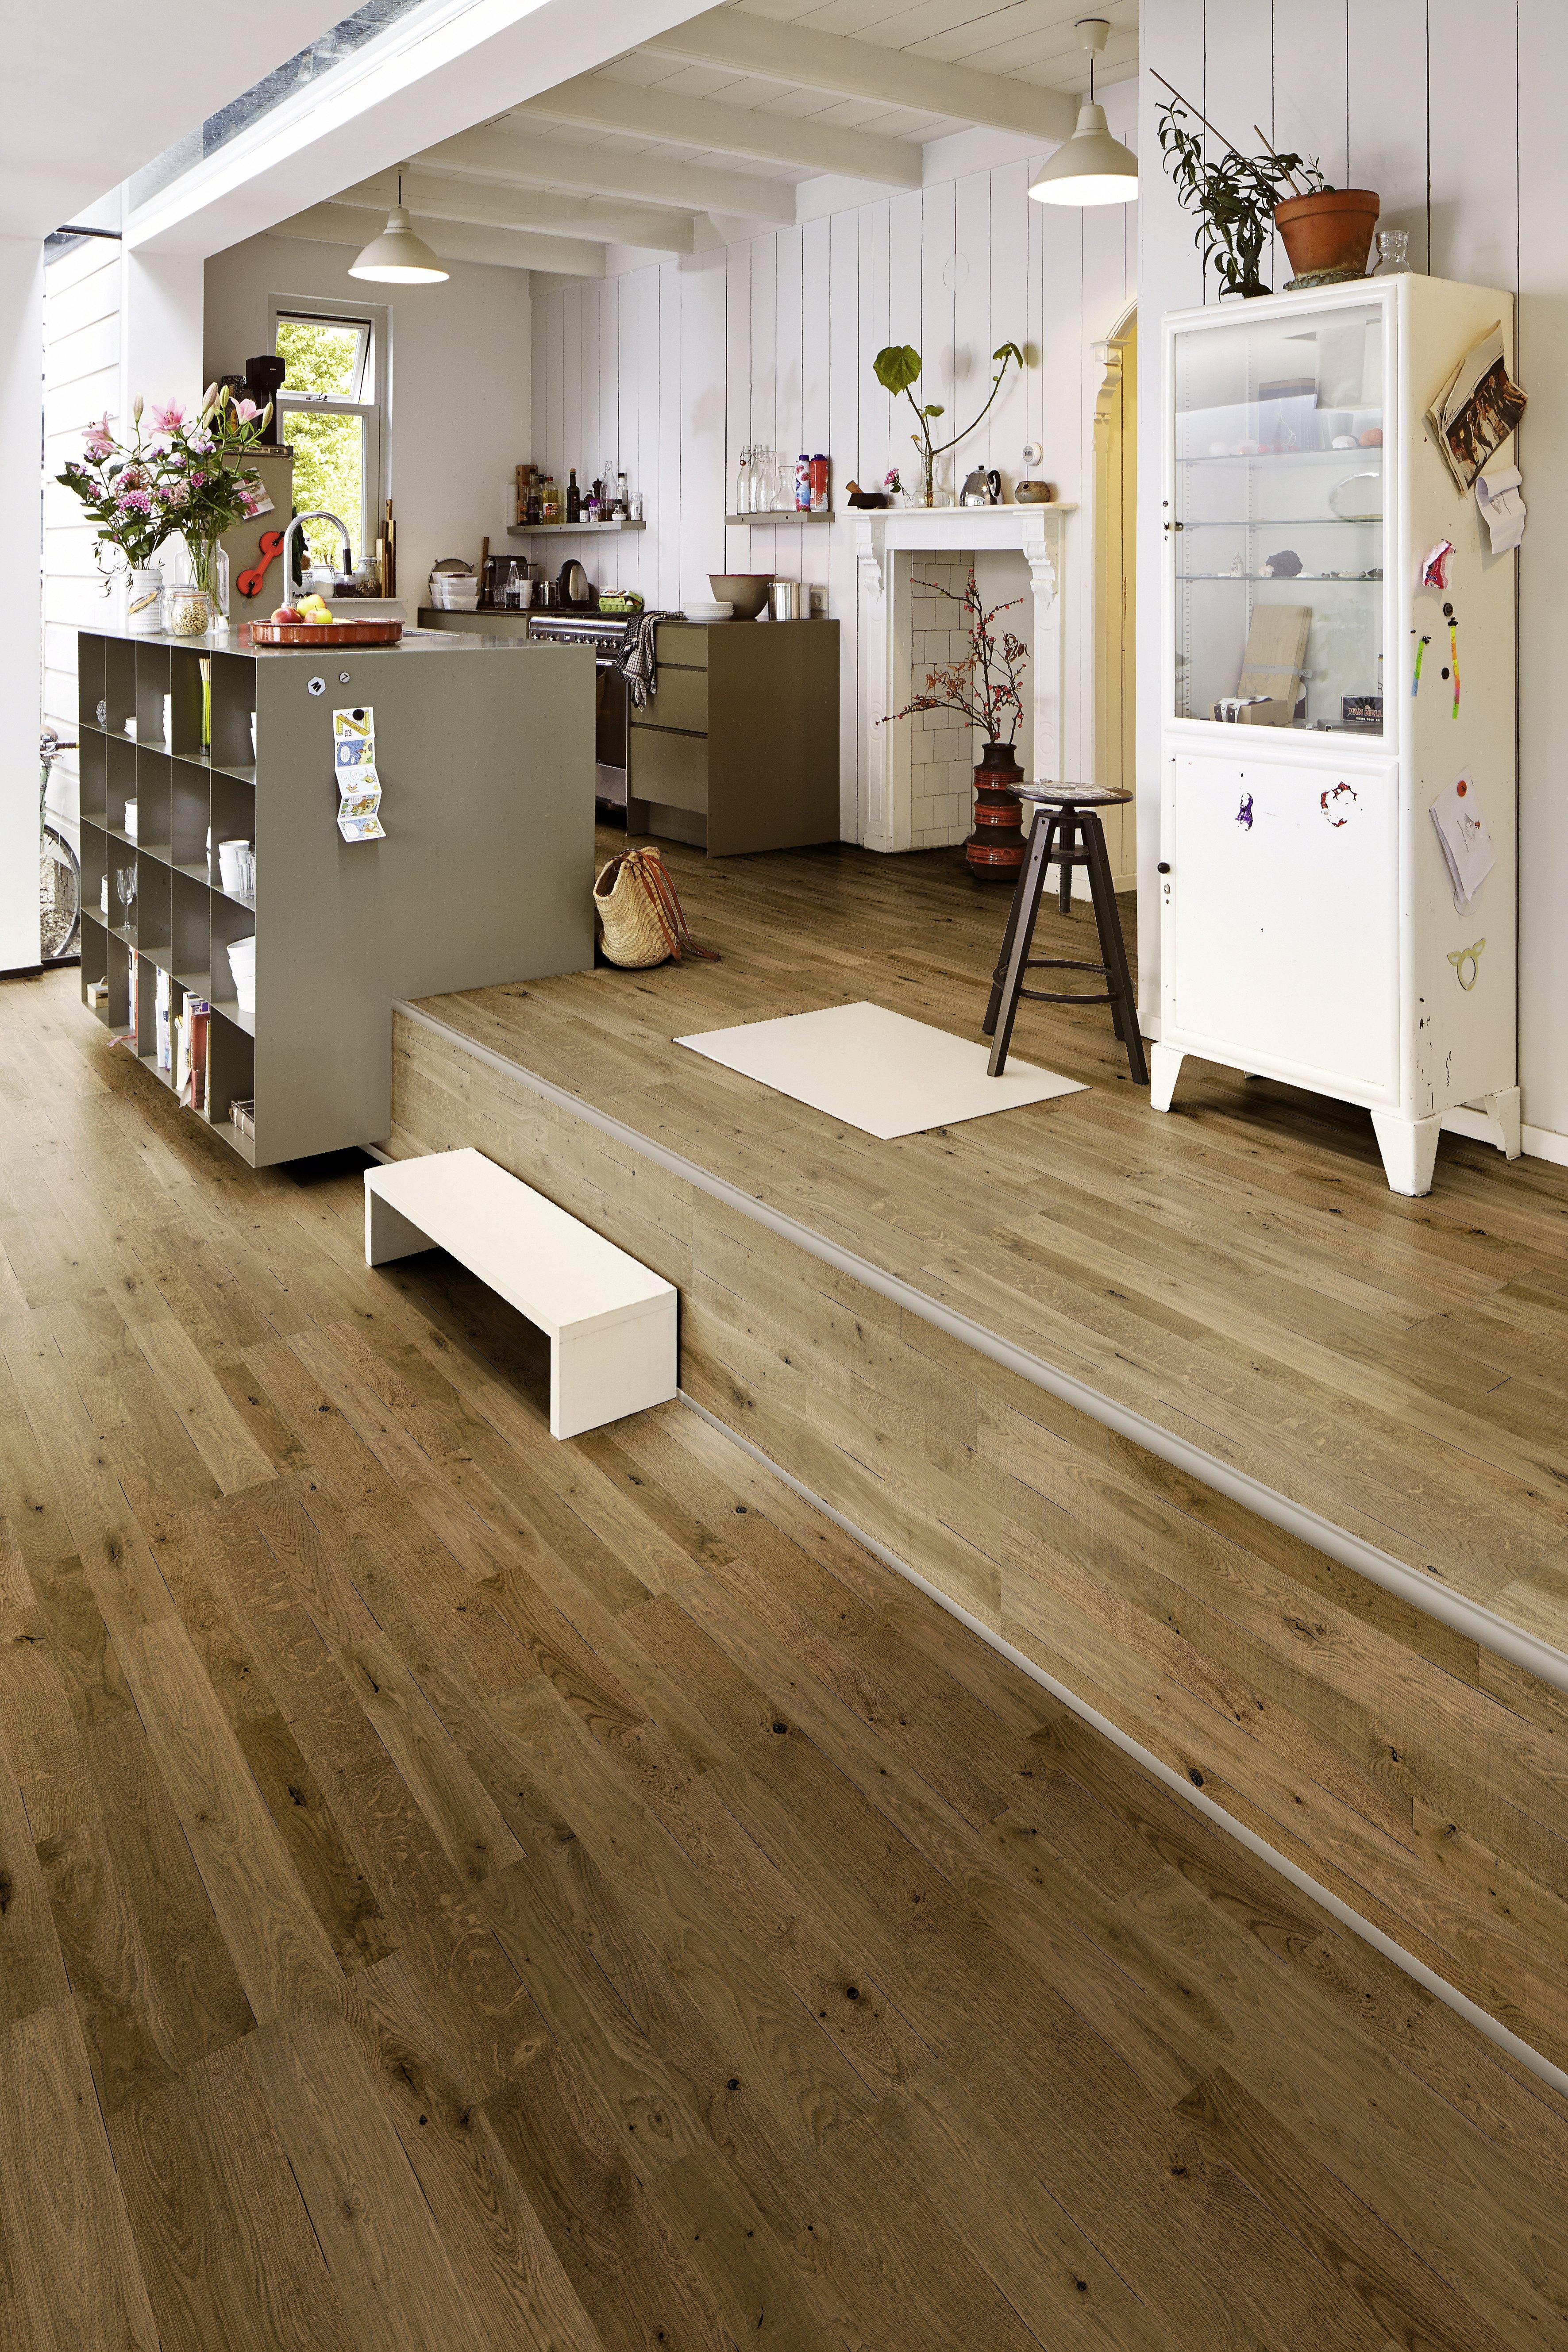 parkett s gerau jetzt online kaufen daedelow parkett. Black Bedroom Furniture Sets. Home Design Ideas